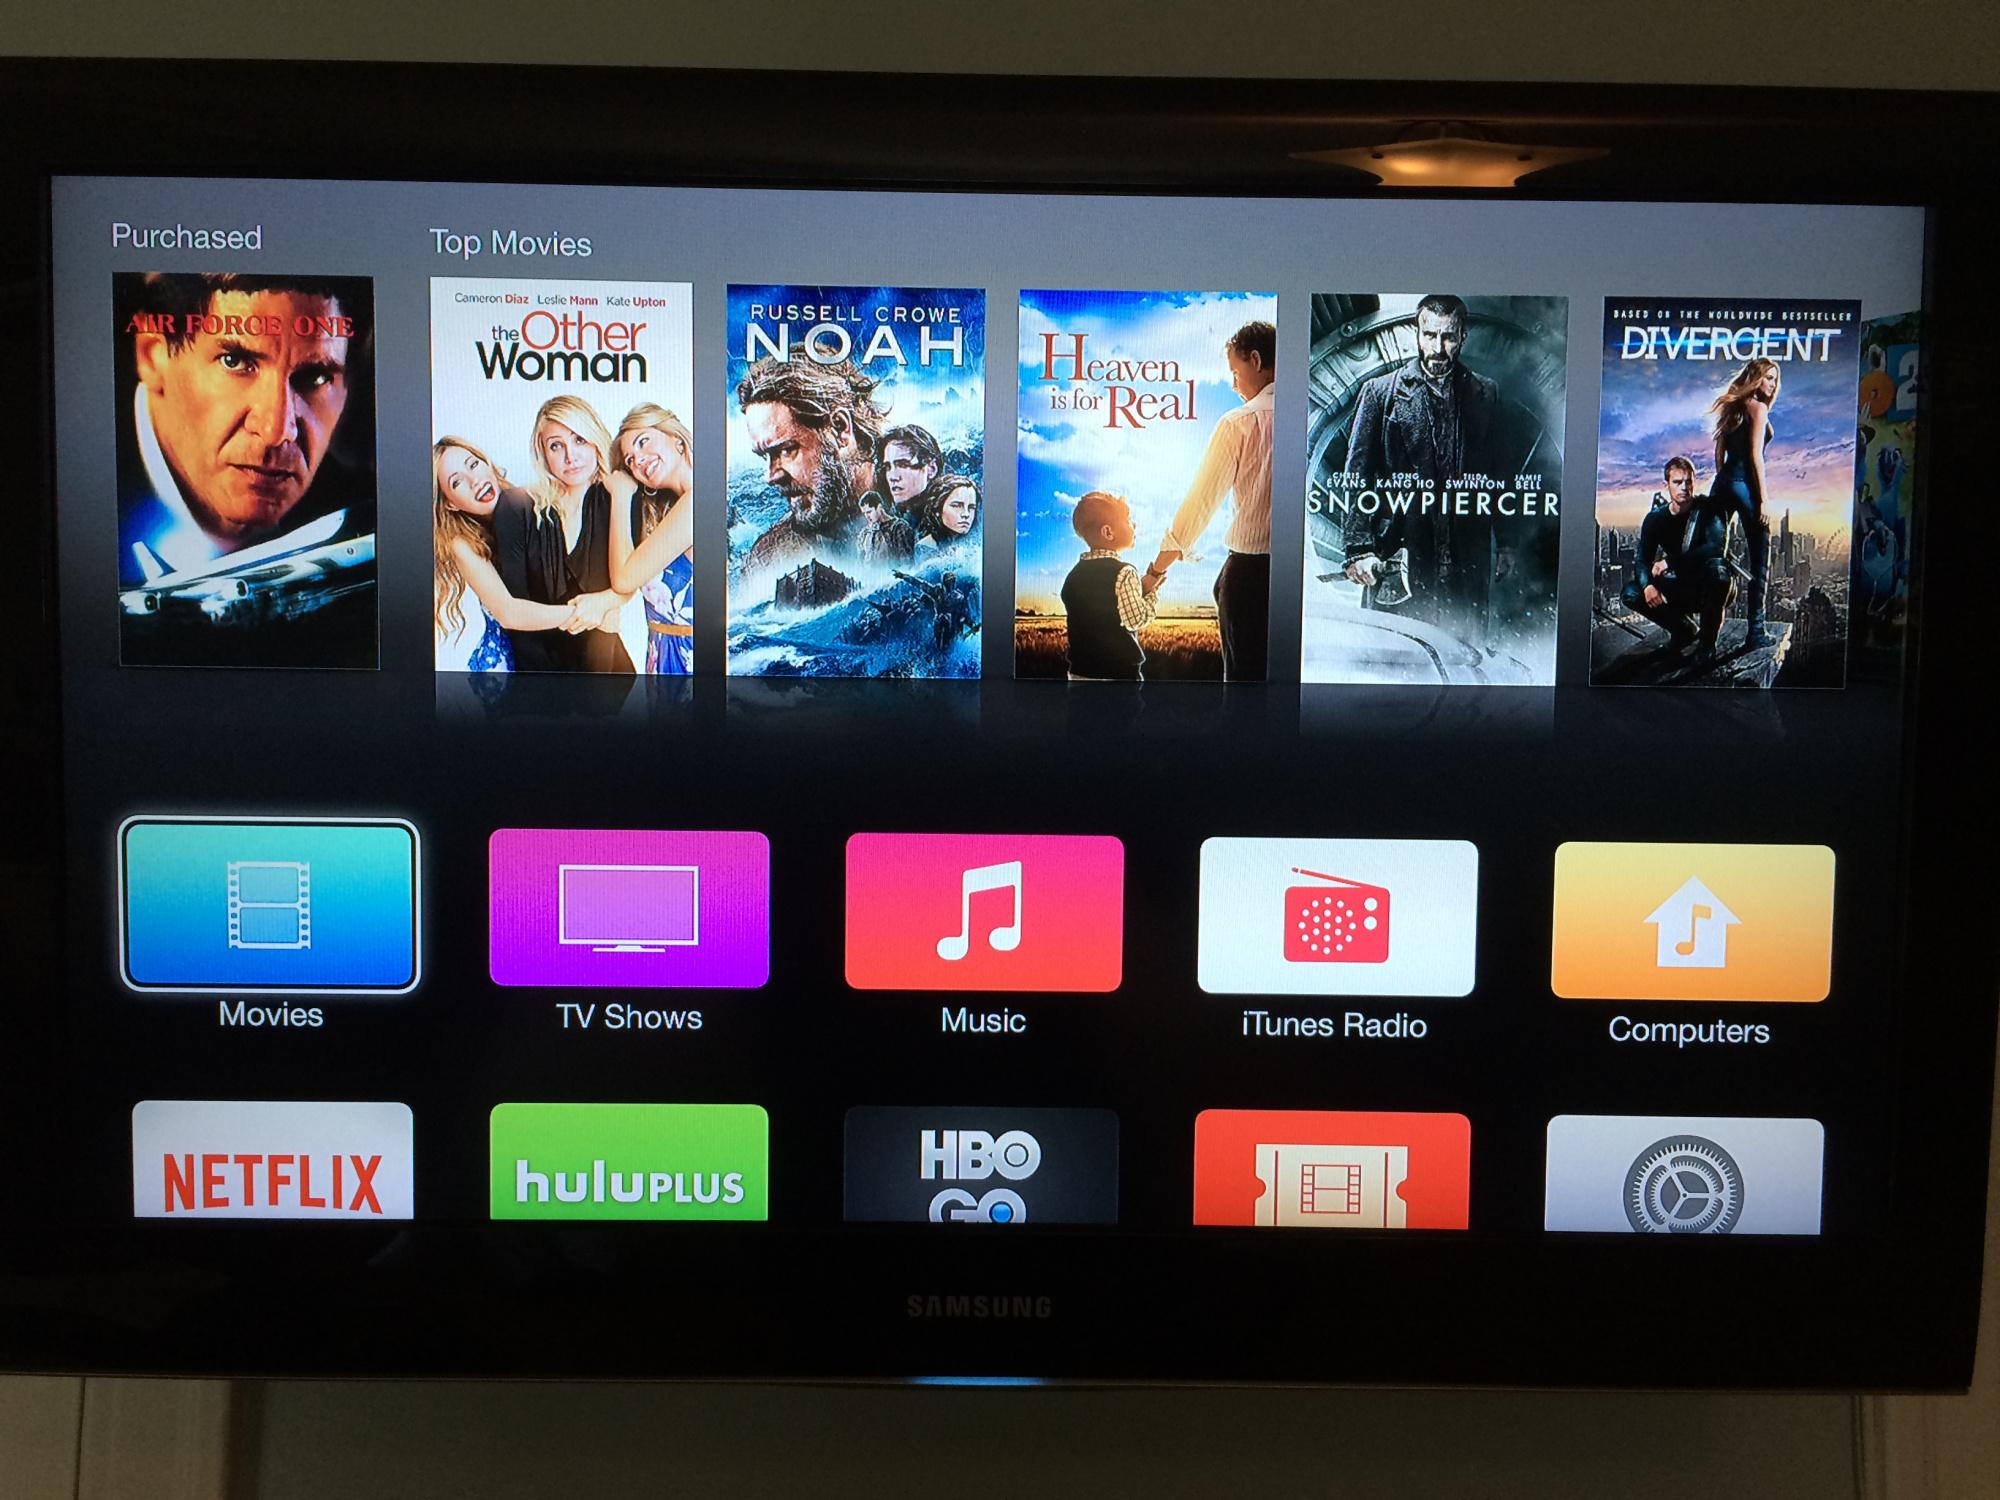 img 9311 LApple TV se met (enfin) au design iOS 7